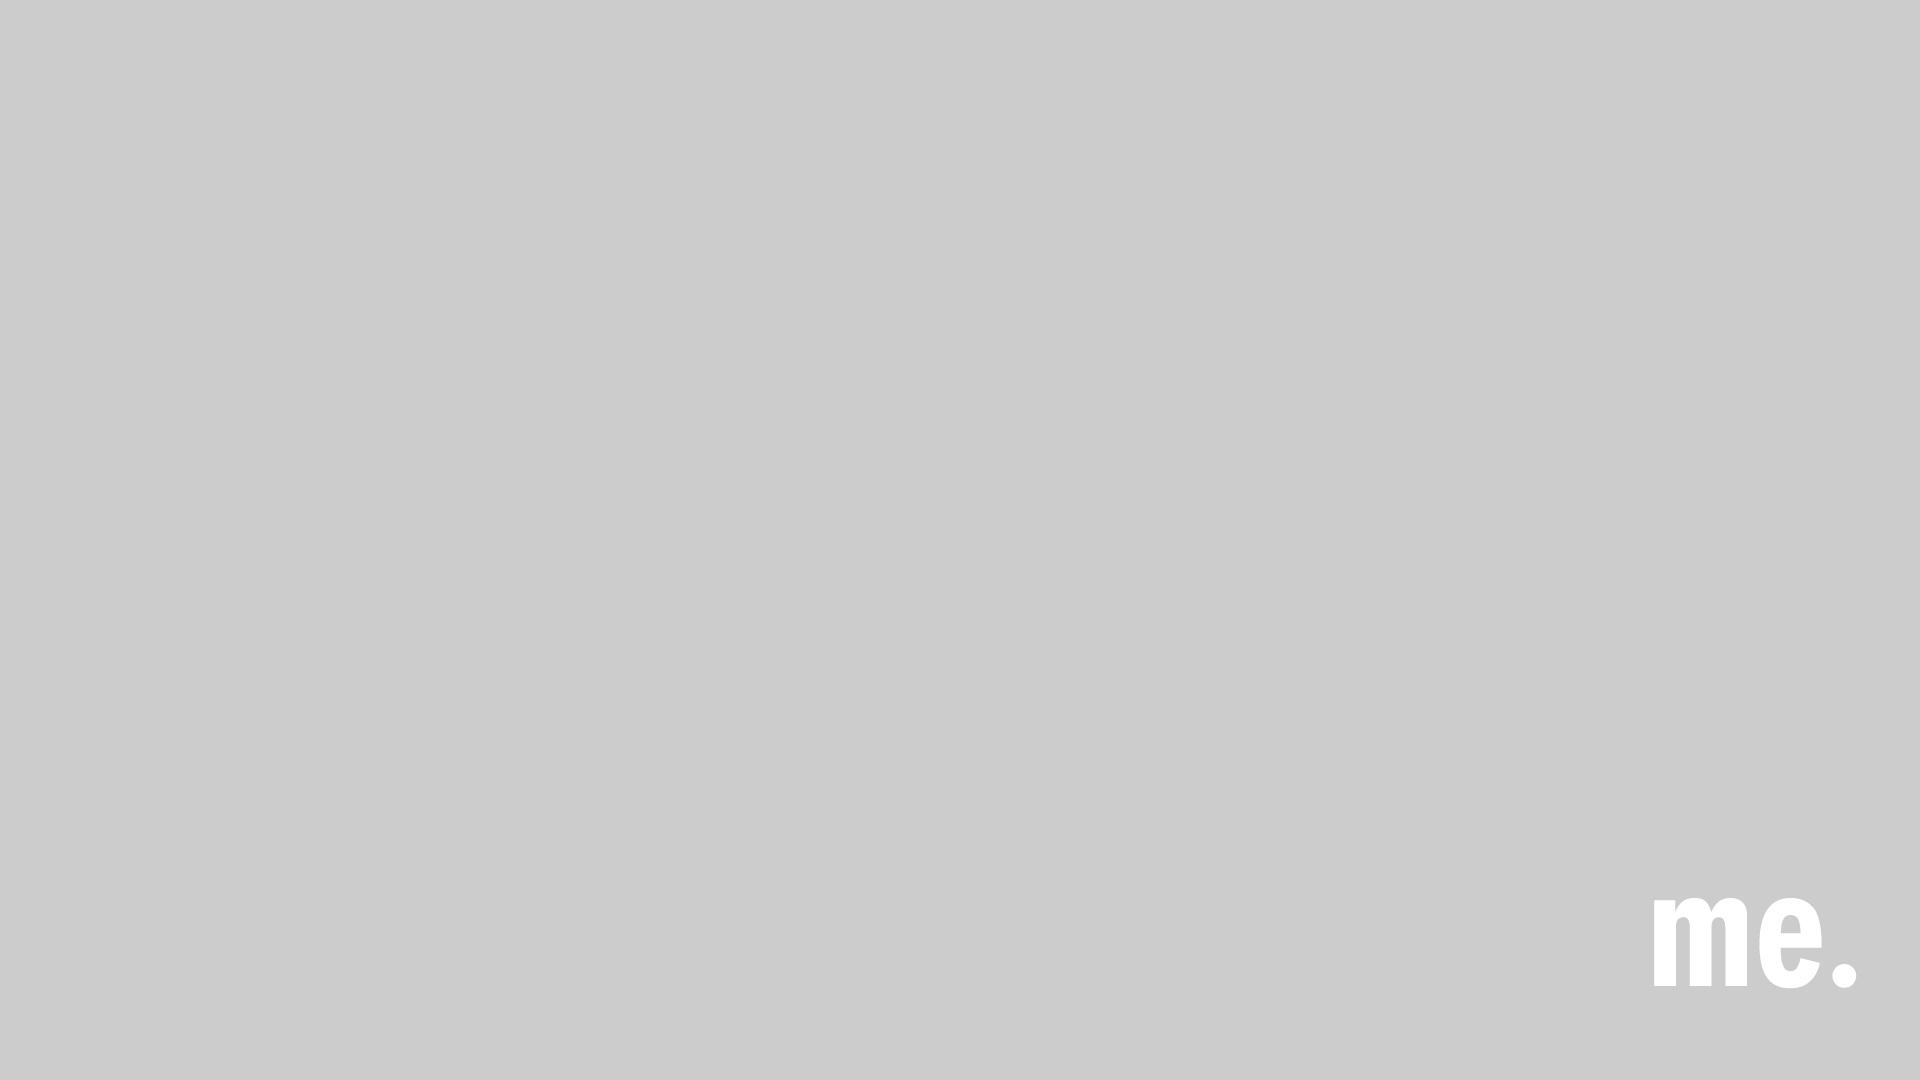 Ryan Adams' neue EP im Stream